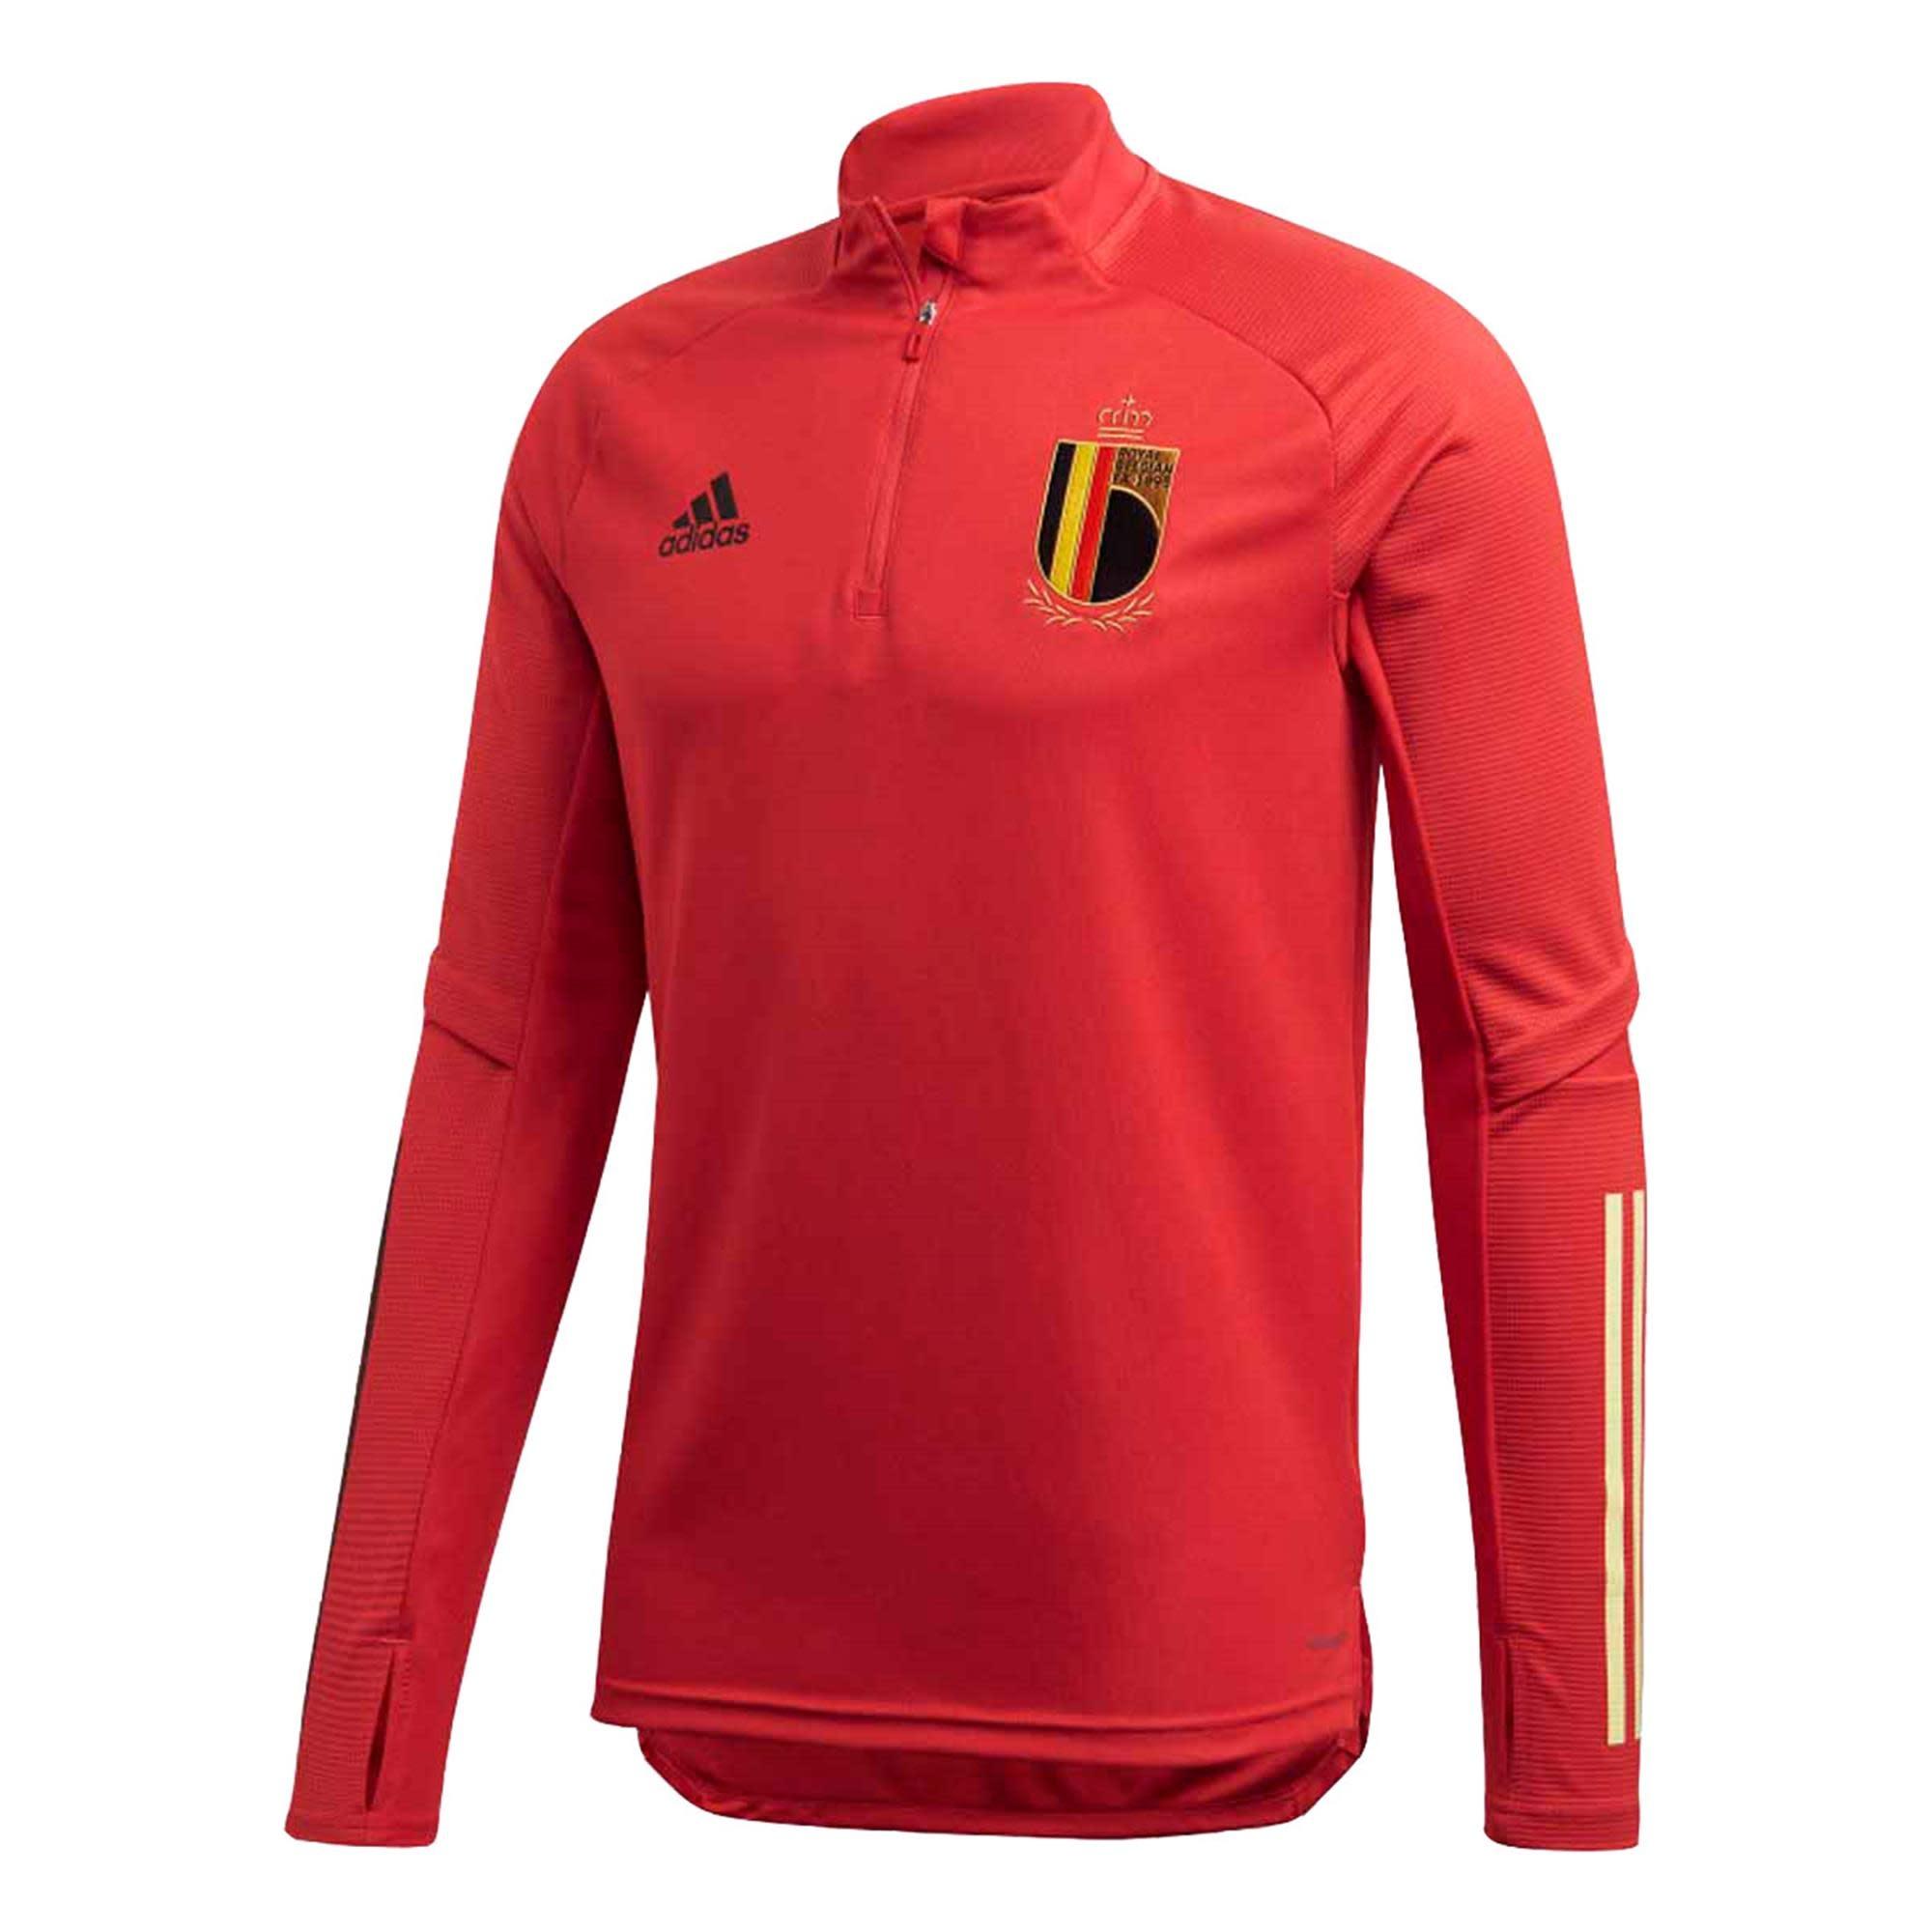 Adidas ADIDAS België Training Top